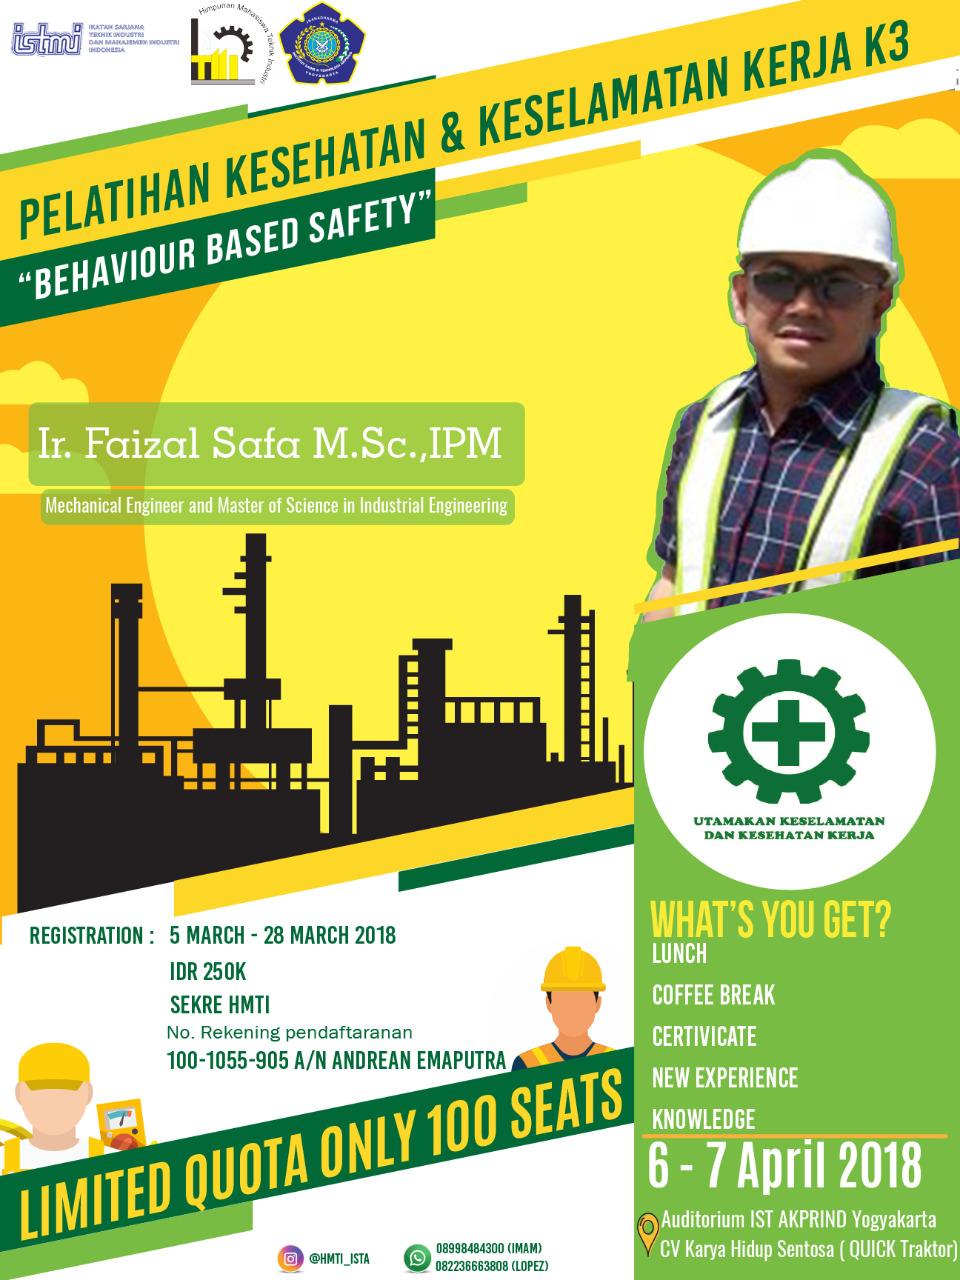 Ikutilah Pelatihan Kesehatan & Keselamatan Kerja K3 Jurusan Teknik Industri bekerjasama dengan ISTMI !!!